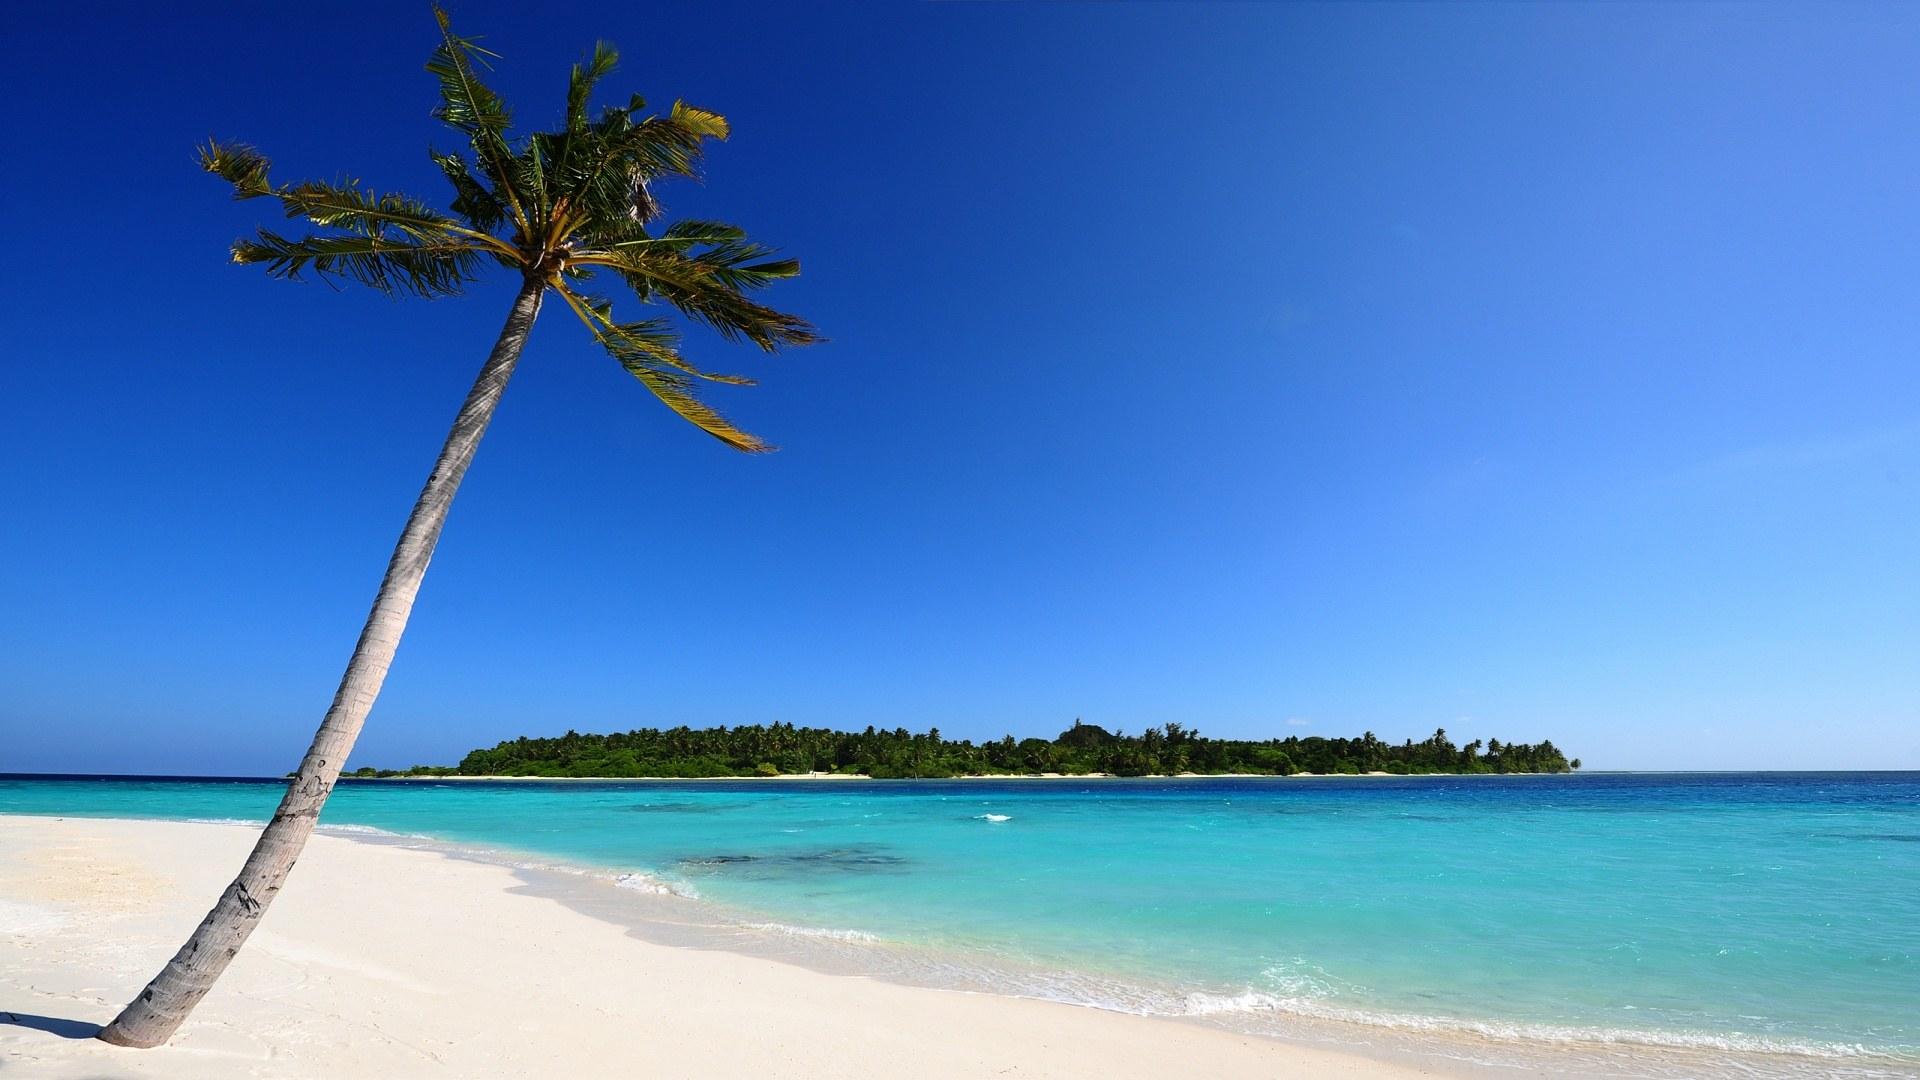 Palm Tree On Maldivian Beach 1920x1080 HD Wallpaper Sunny Beaches 1920x1080